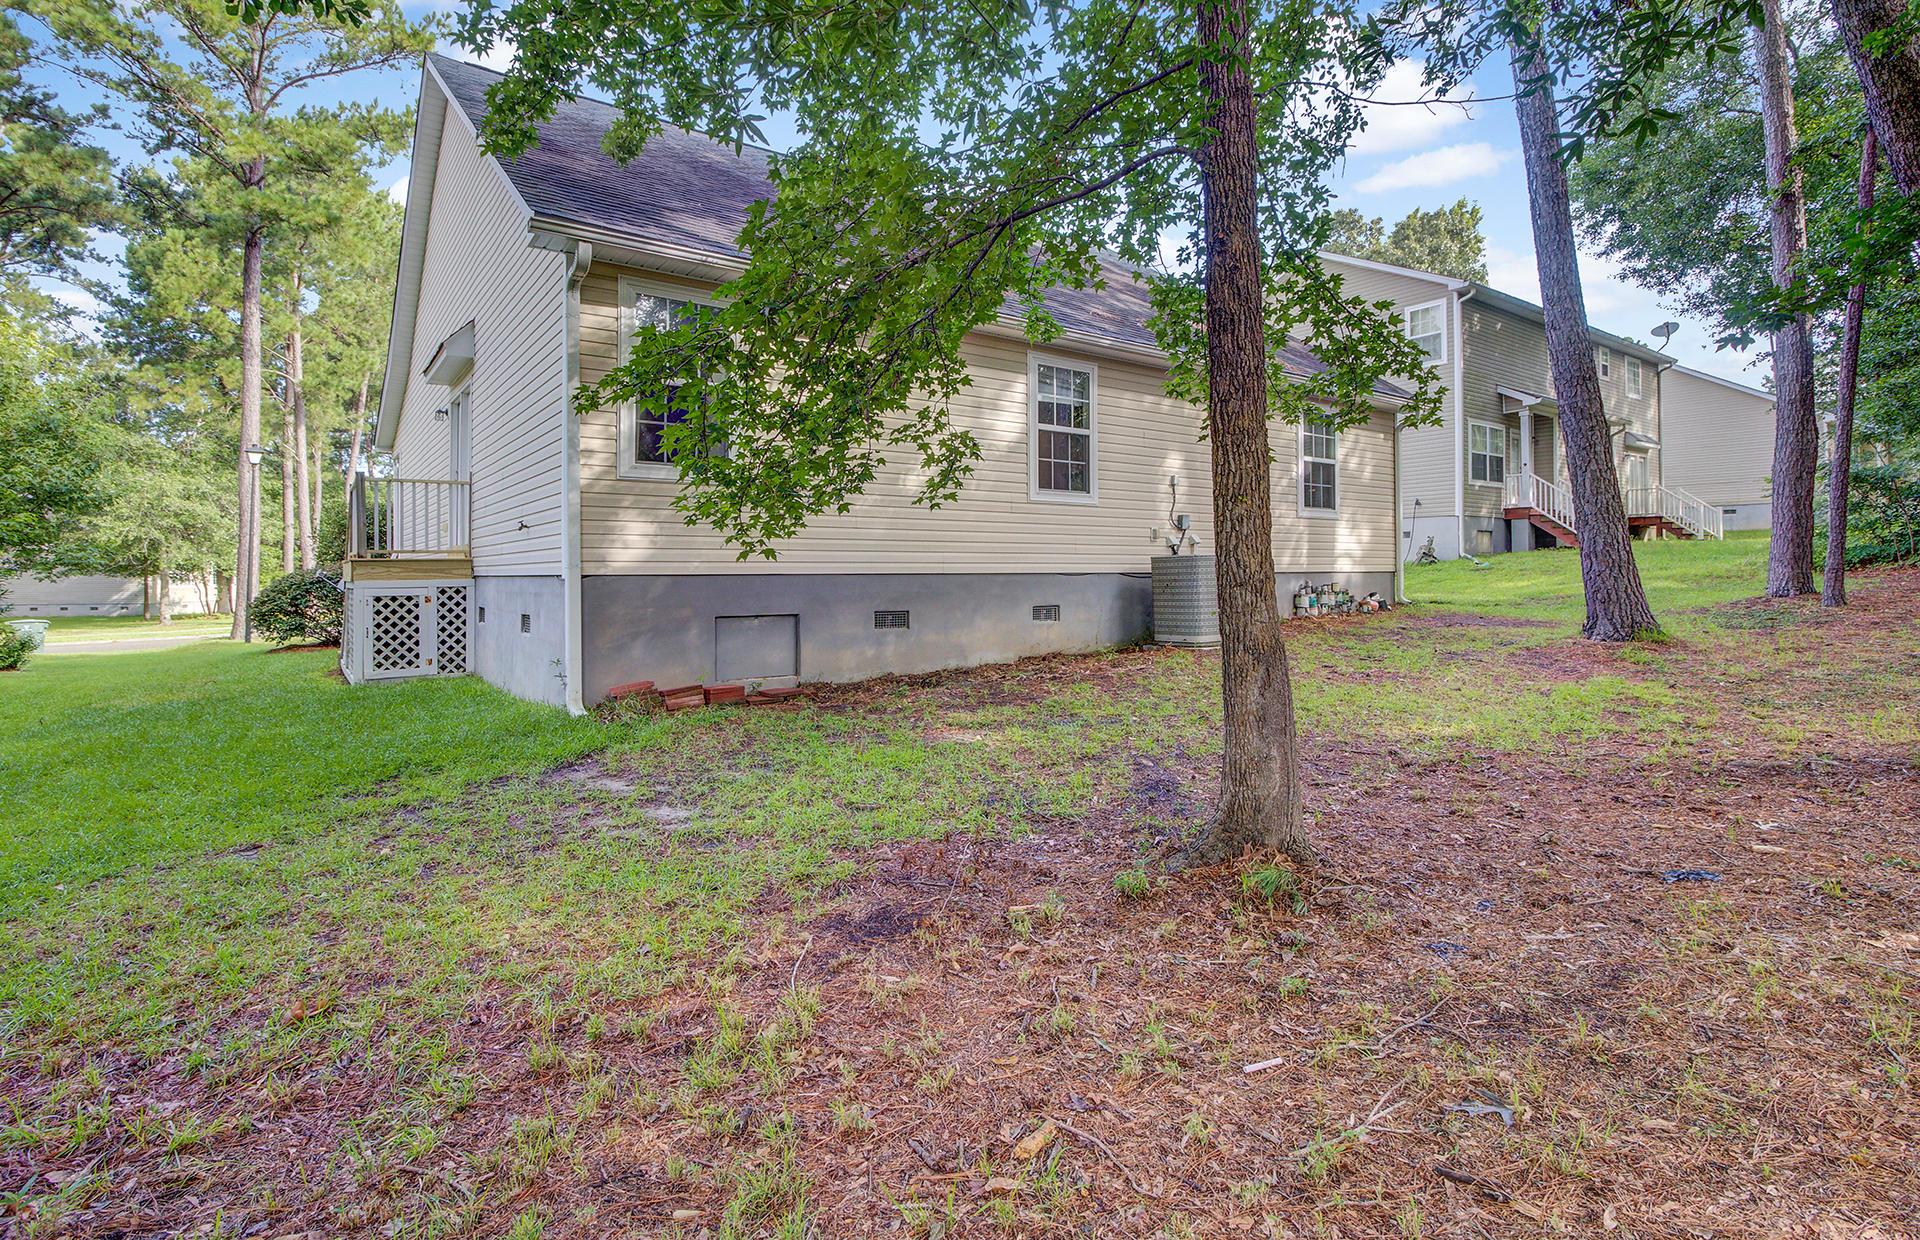 Kennsington Homes For Sale - 108 Heatherlock, Hanahan, SC - 1